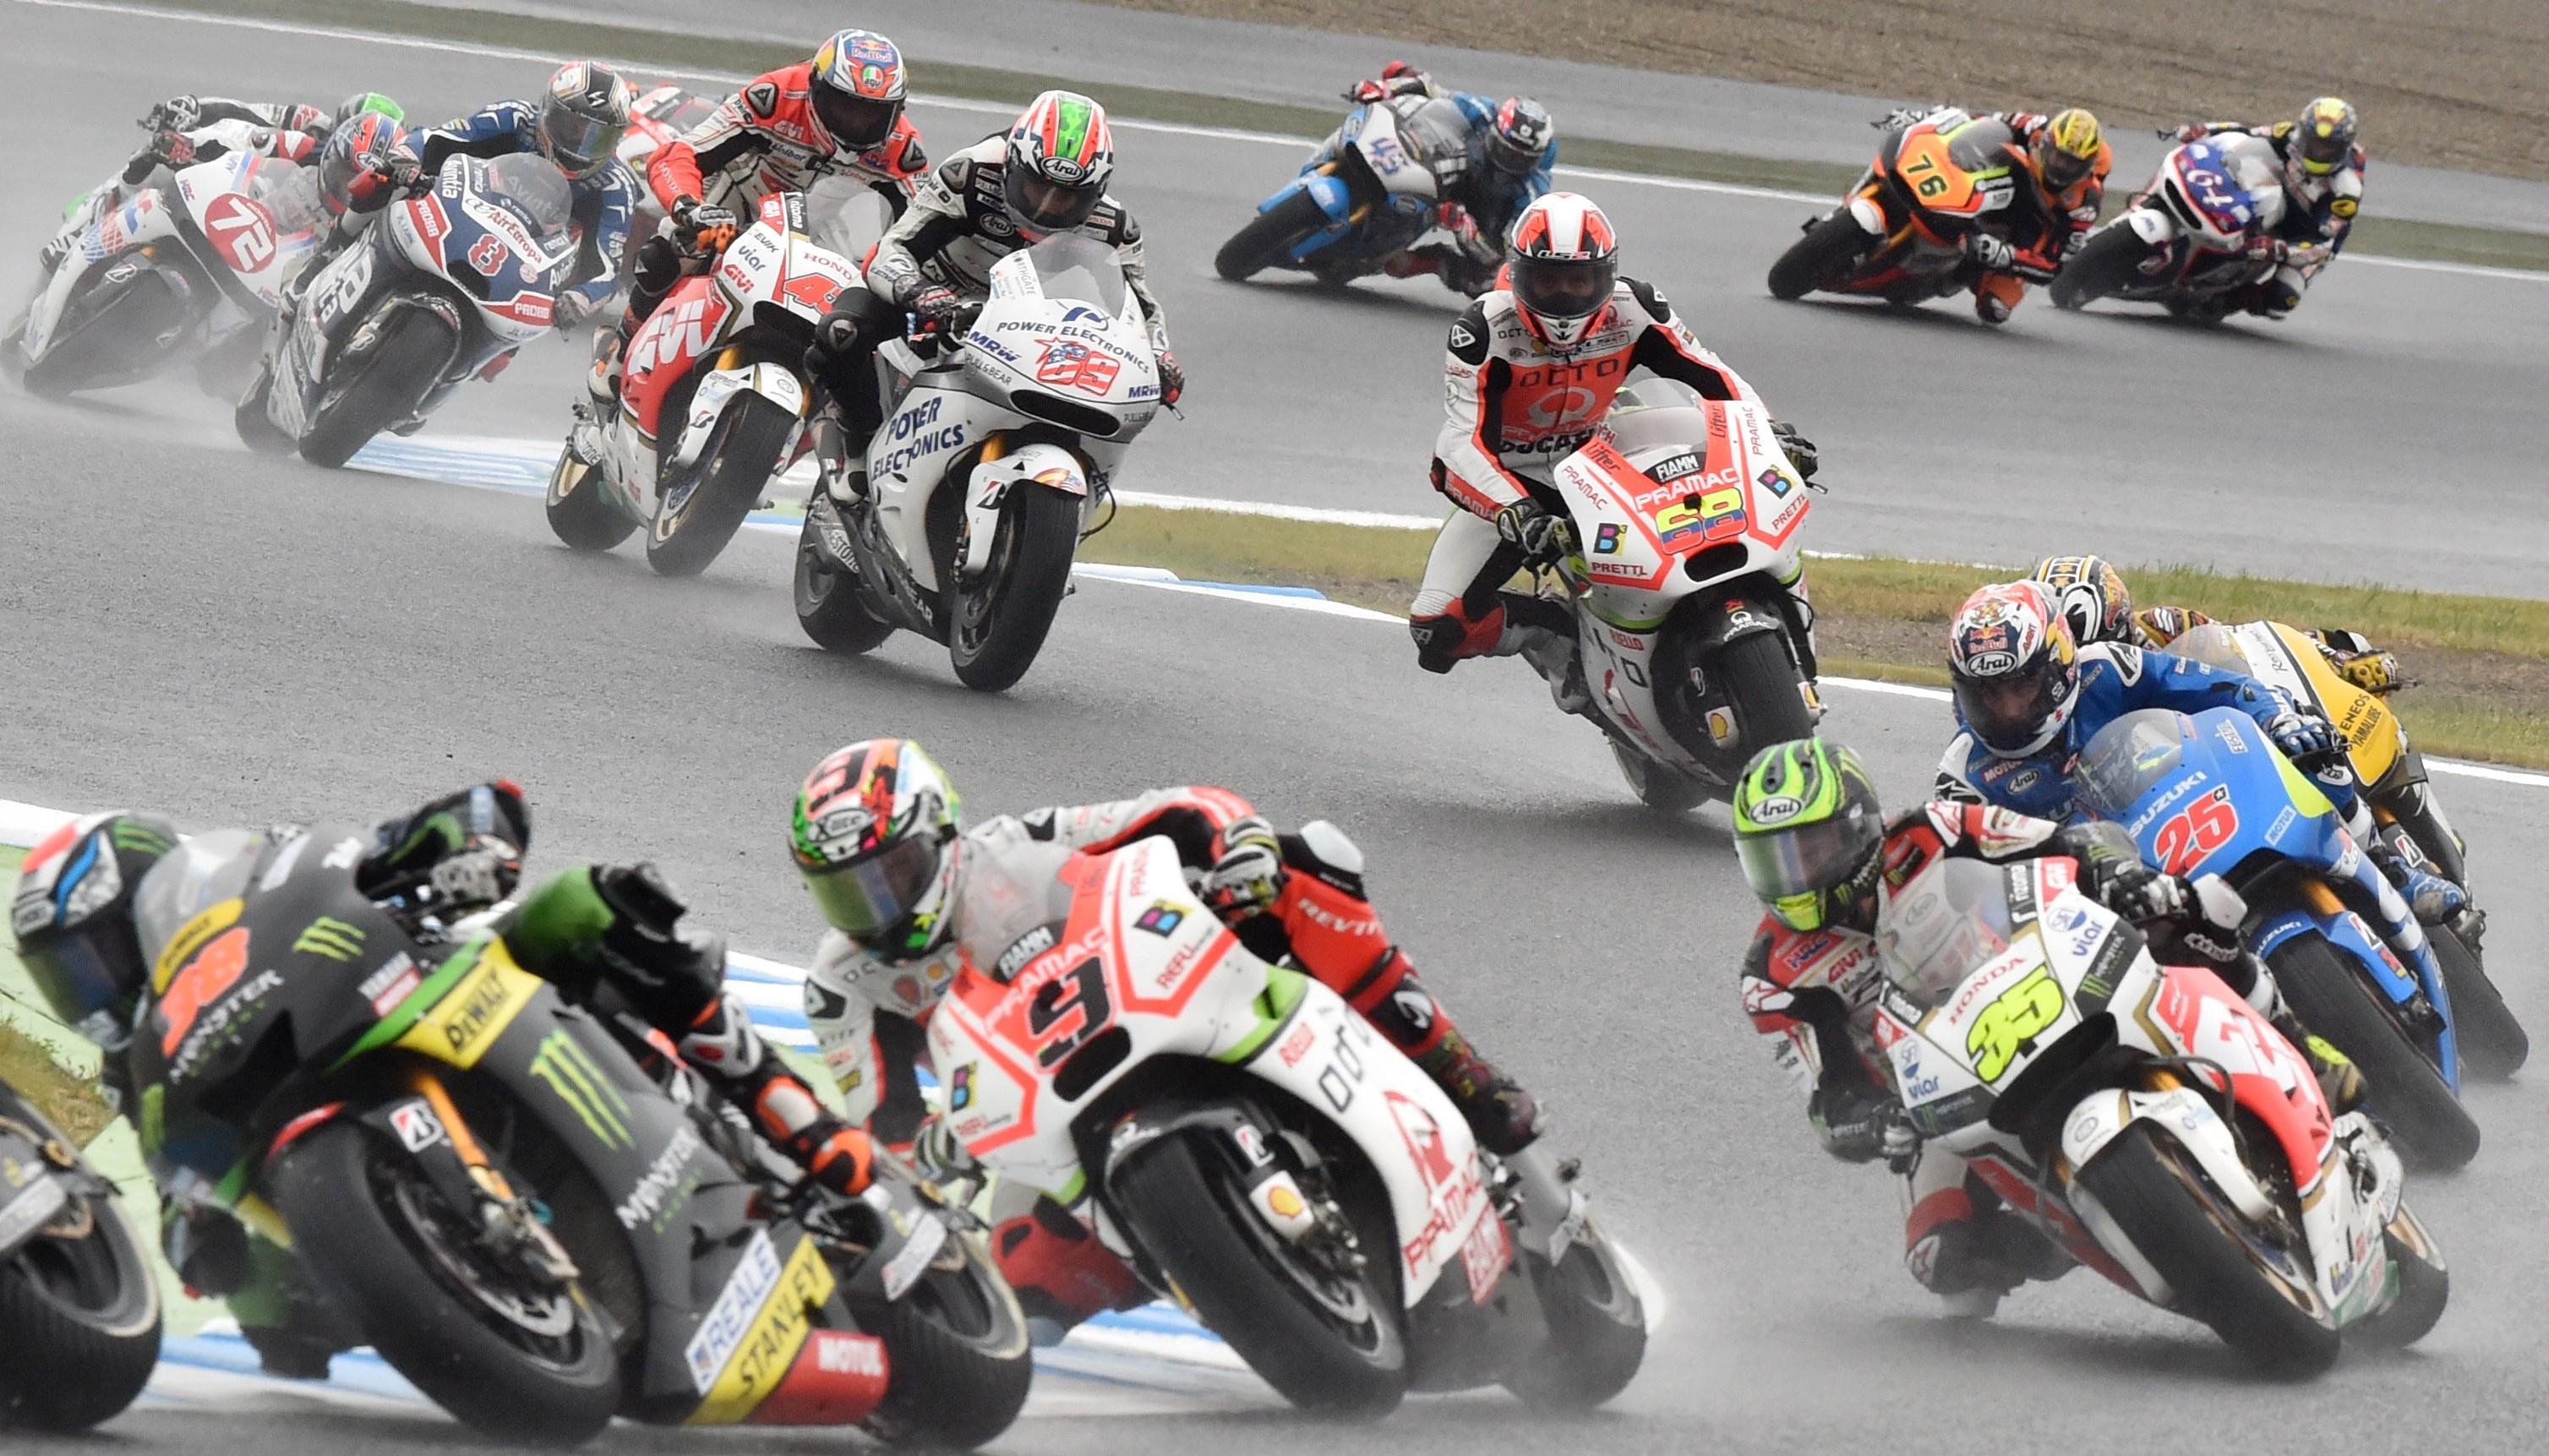 MotoGP 2015: Motegi race results